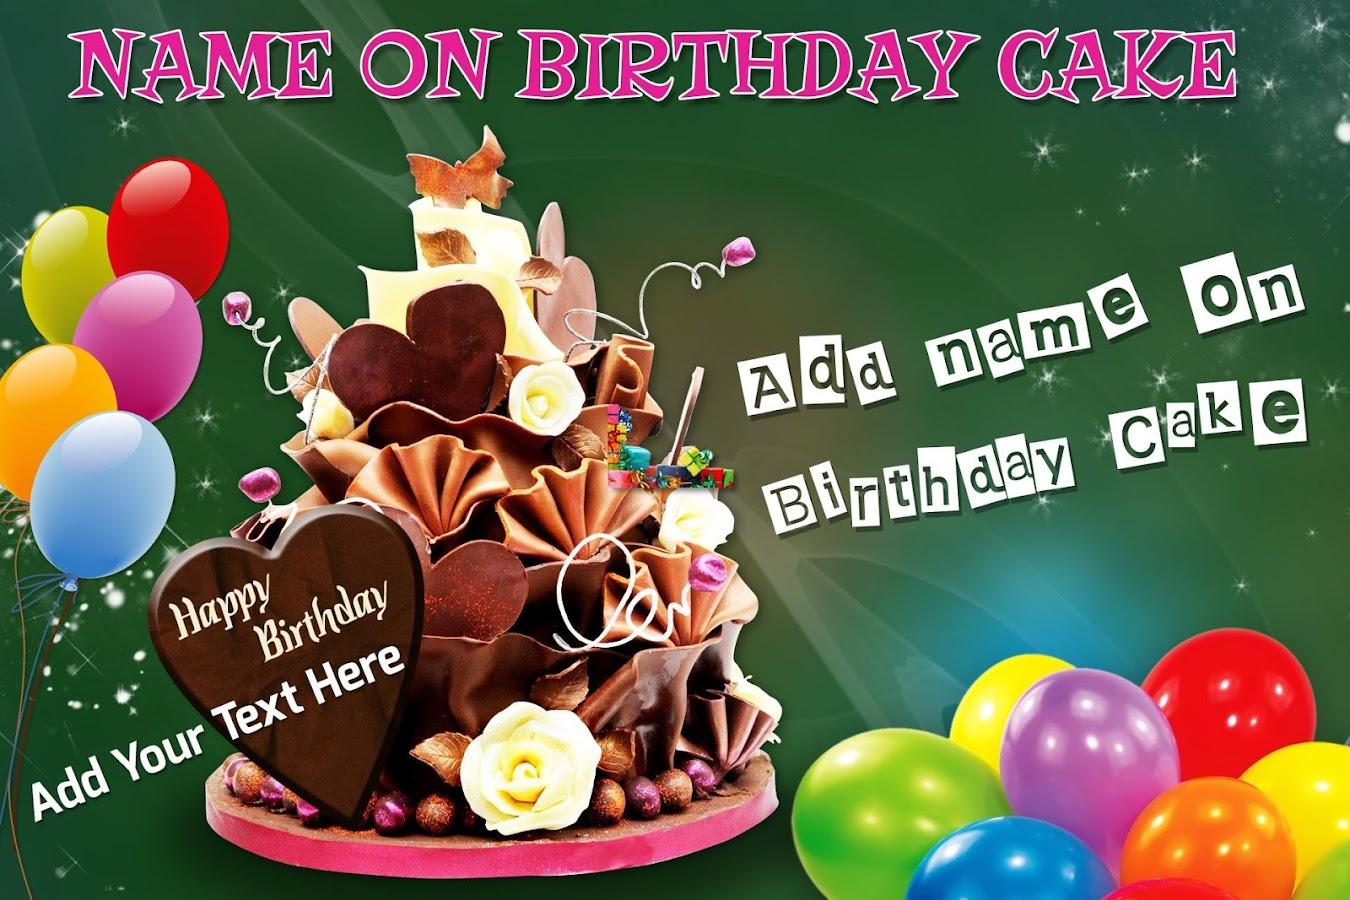 Name On Birthday Cake Photo Birthday Cake 151 Apk Download